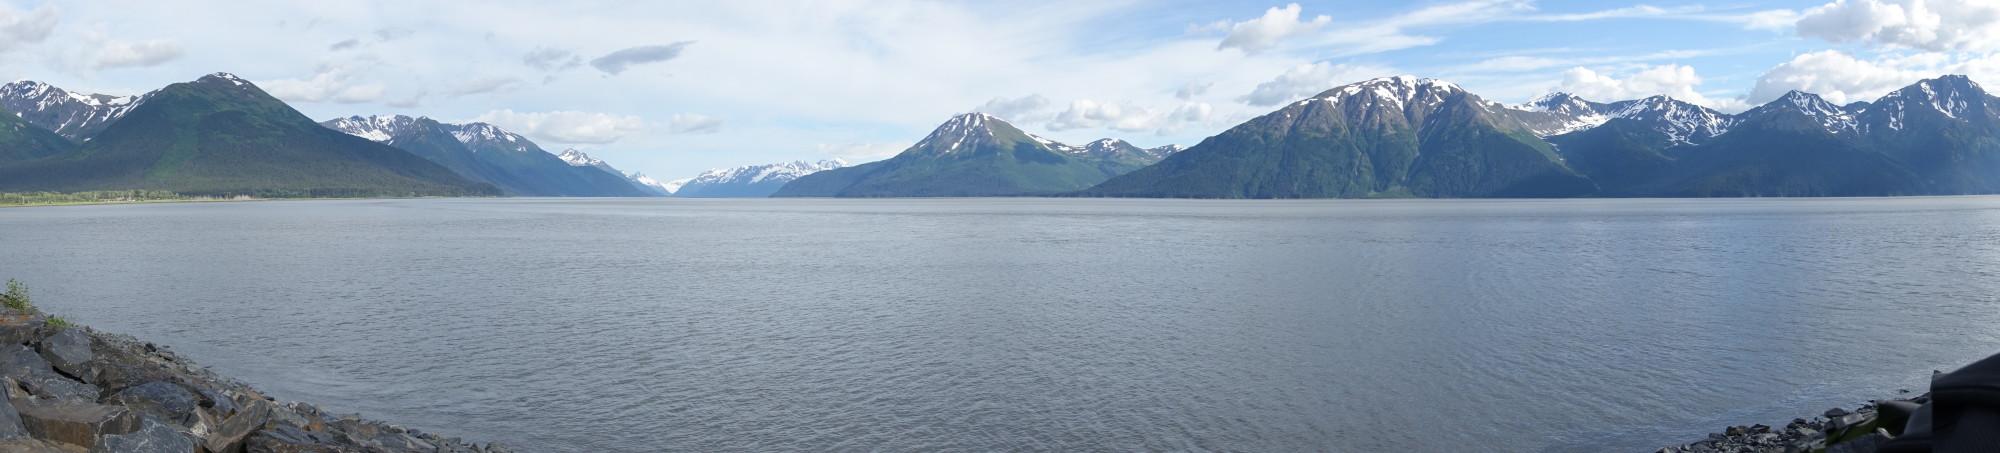 30.06-03.07 Alaska